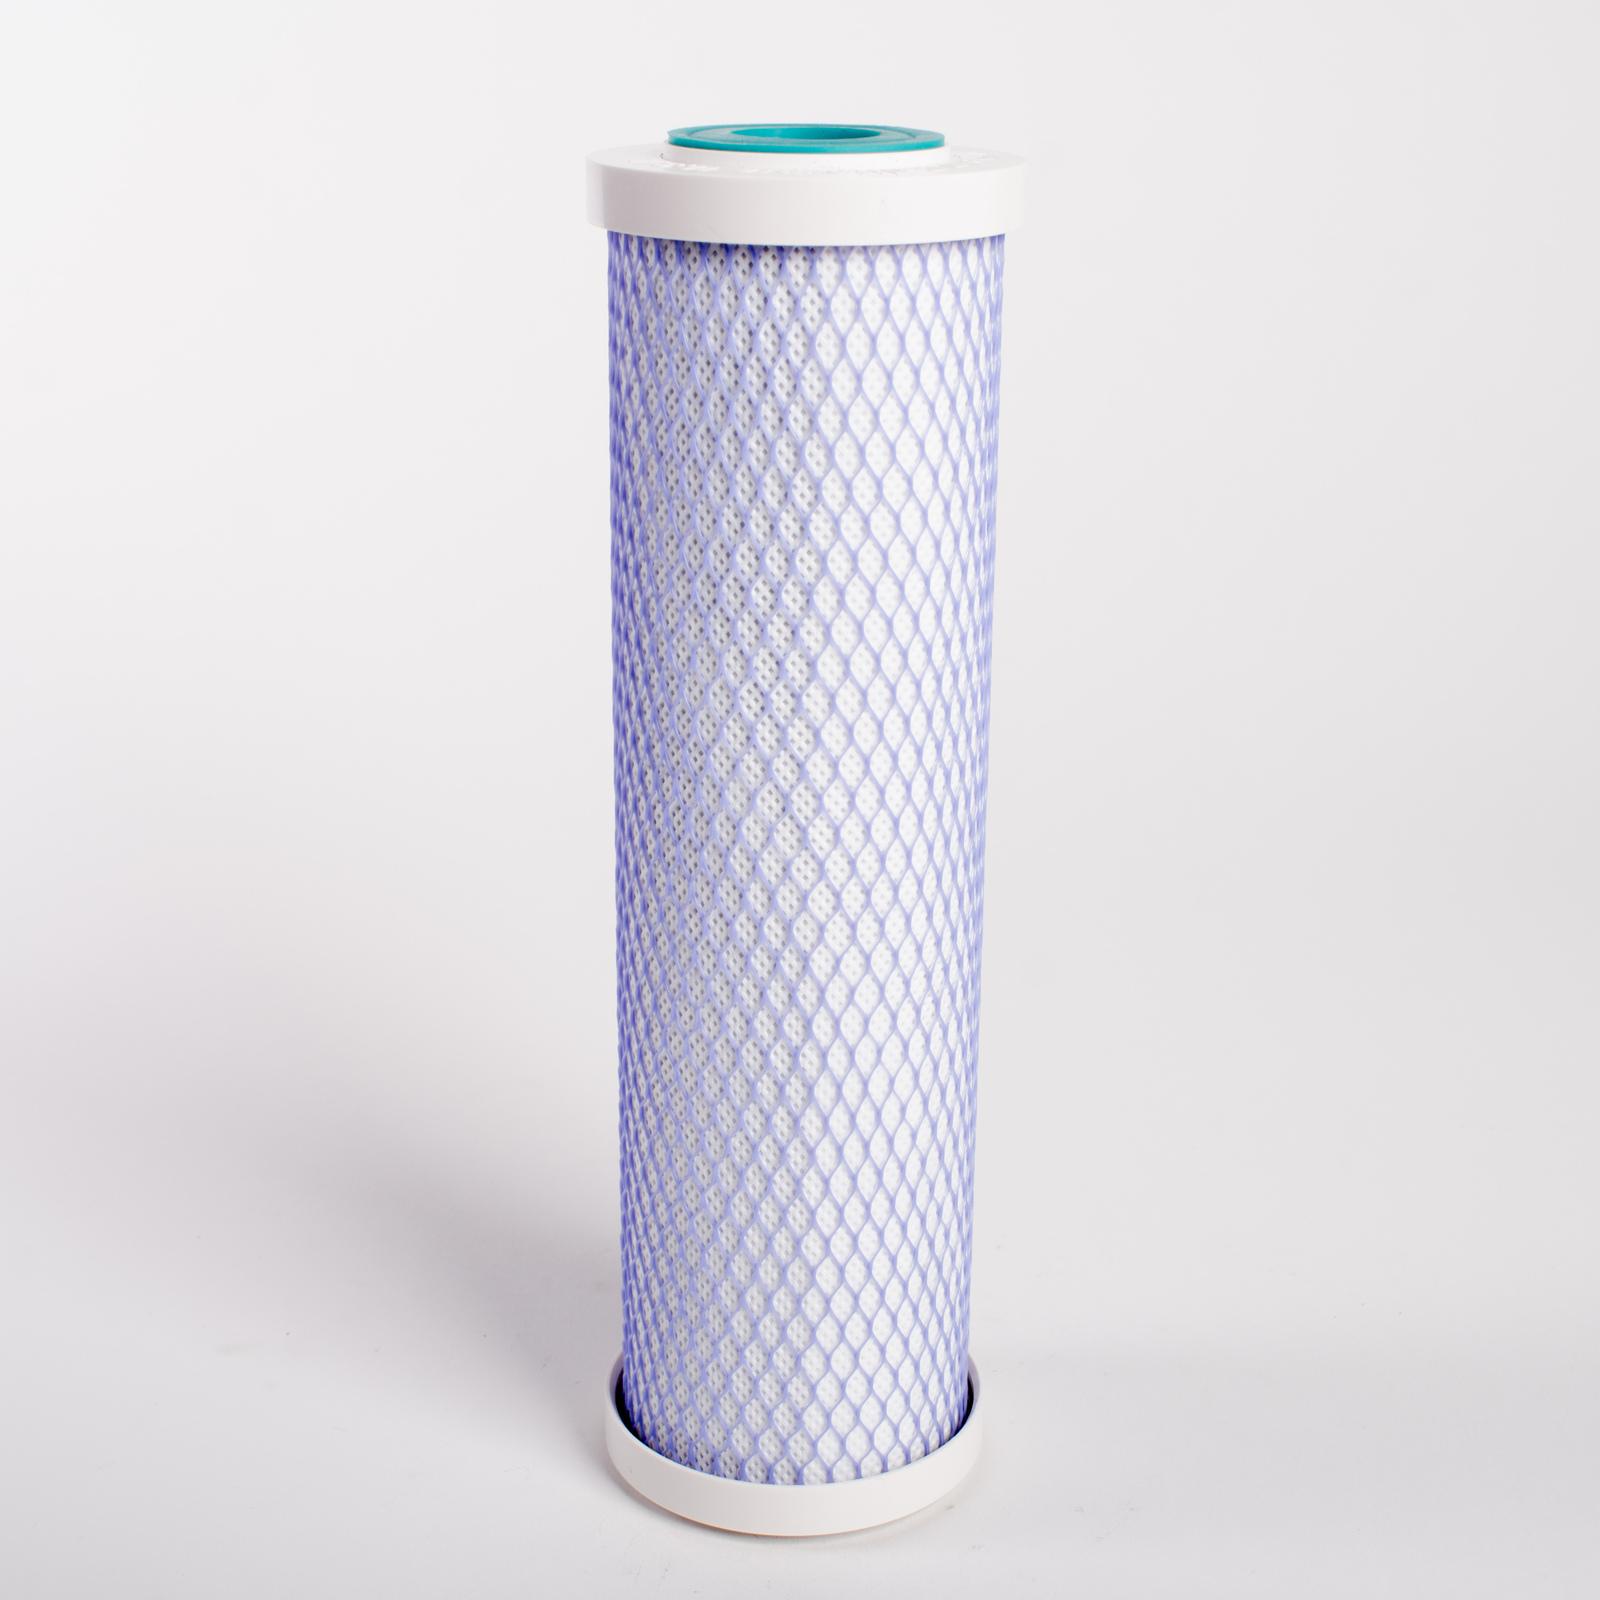 Countertop Water Filter : Countertop Drinking Water Filter (Dark Blue) [Kitchen] - Water Filters